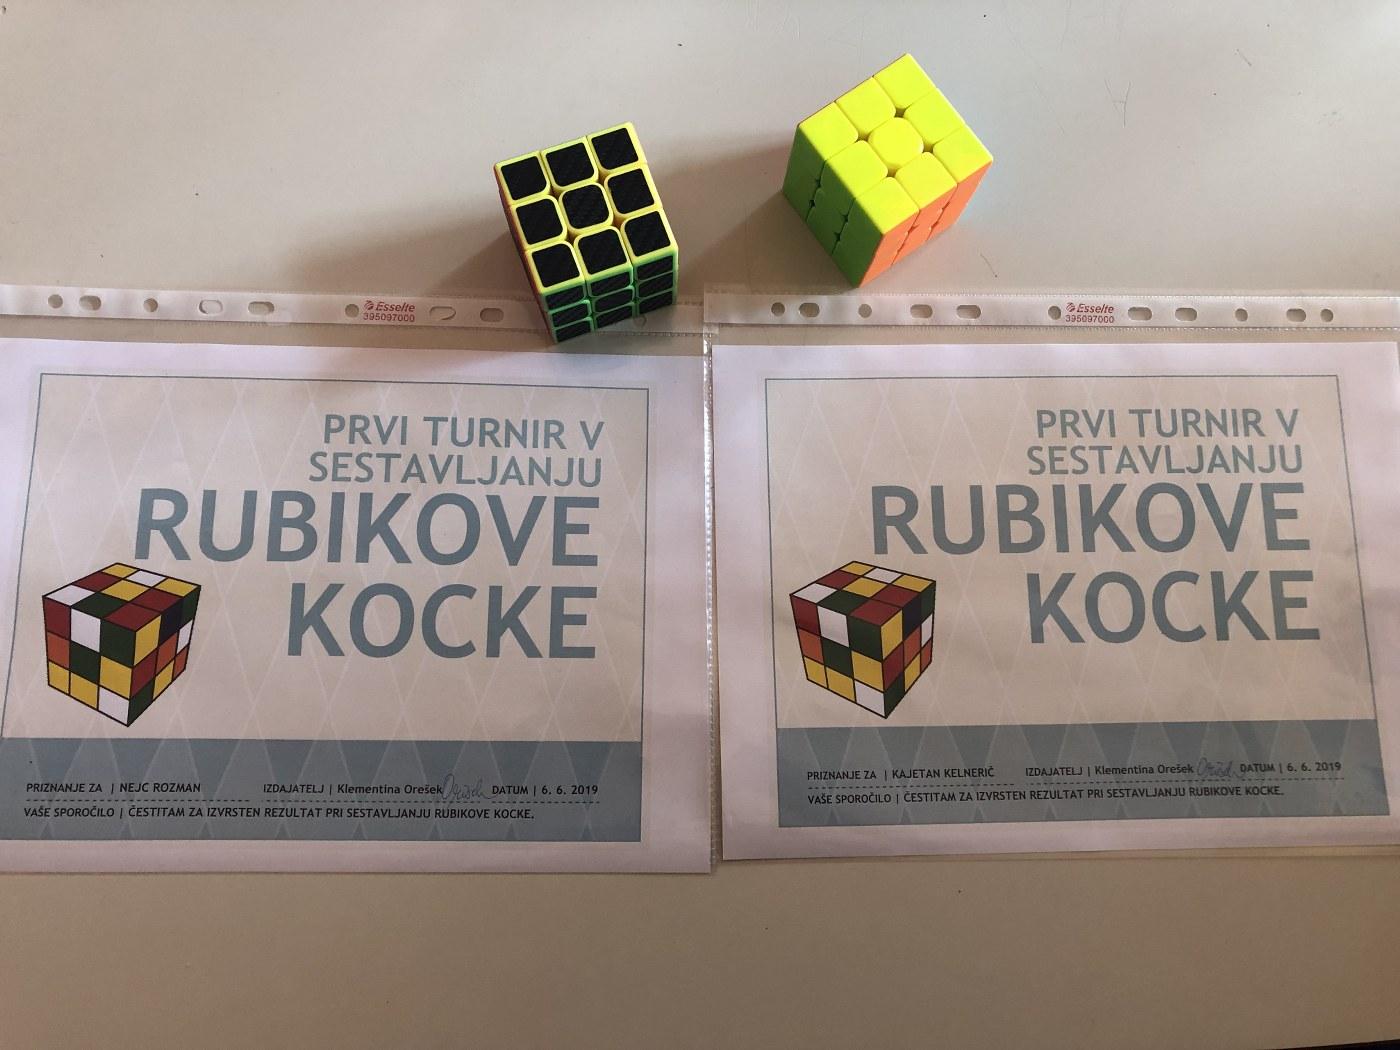 2019_06_06_turnir_rubikova_kocka-1